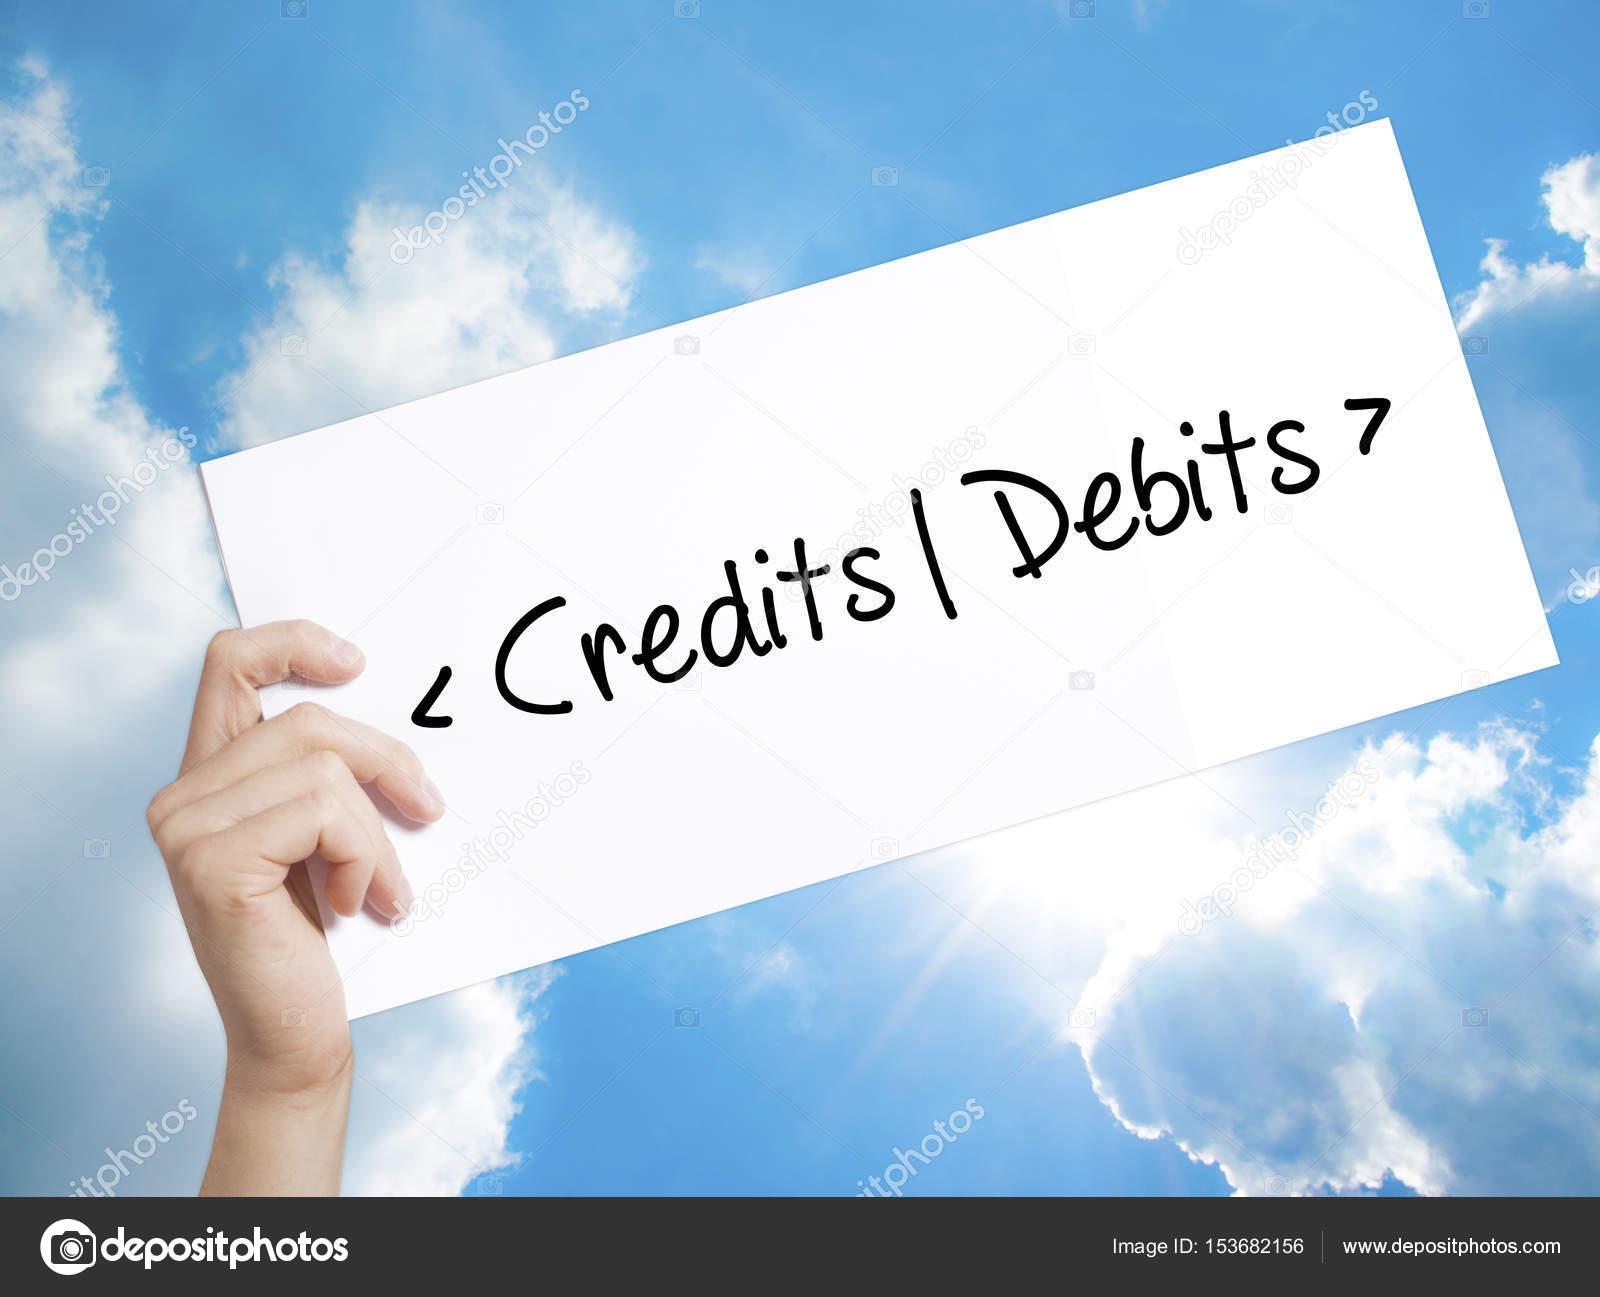 No Credit Symbol Stock Image | k9540033 | Fotosearch | 1297x1600